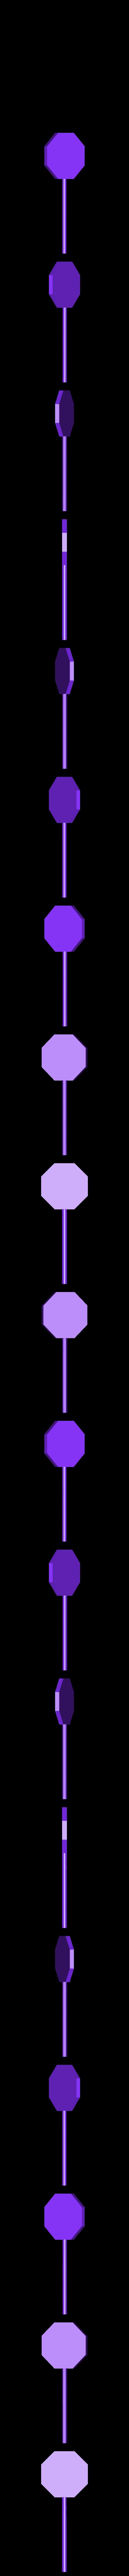 traffic-sign_stop.stl Download free STL file Traffic Sign Models • 3D print model, Saran